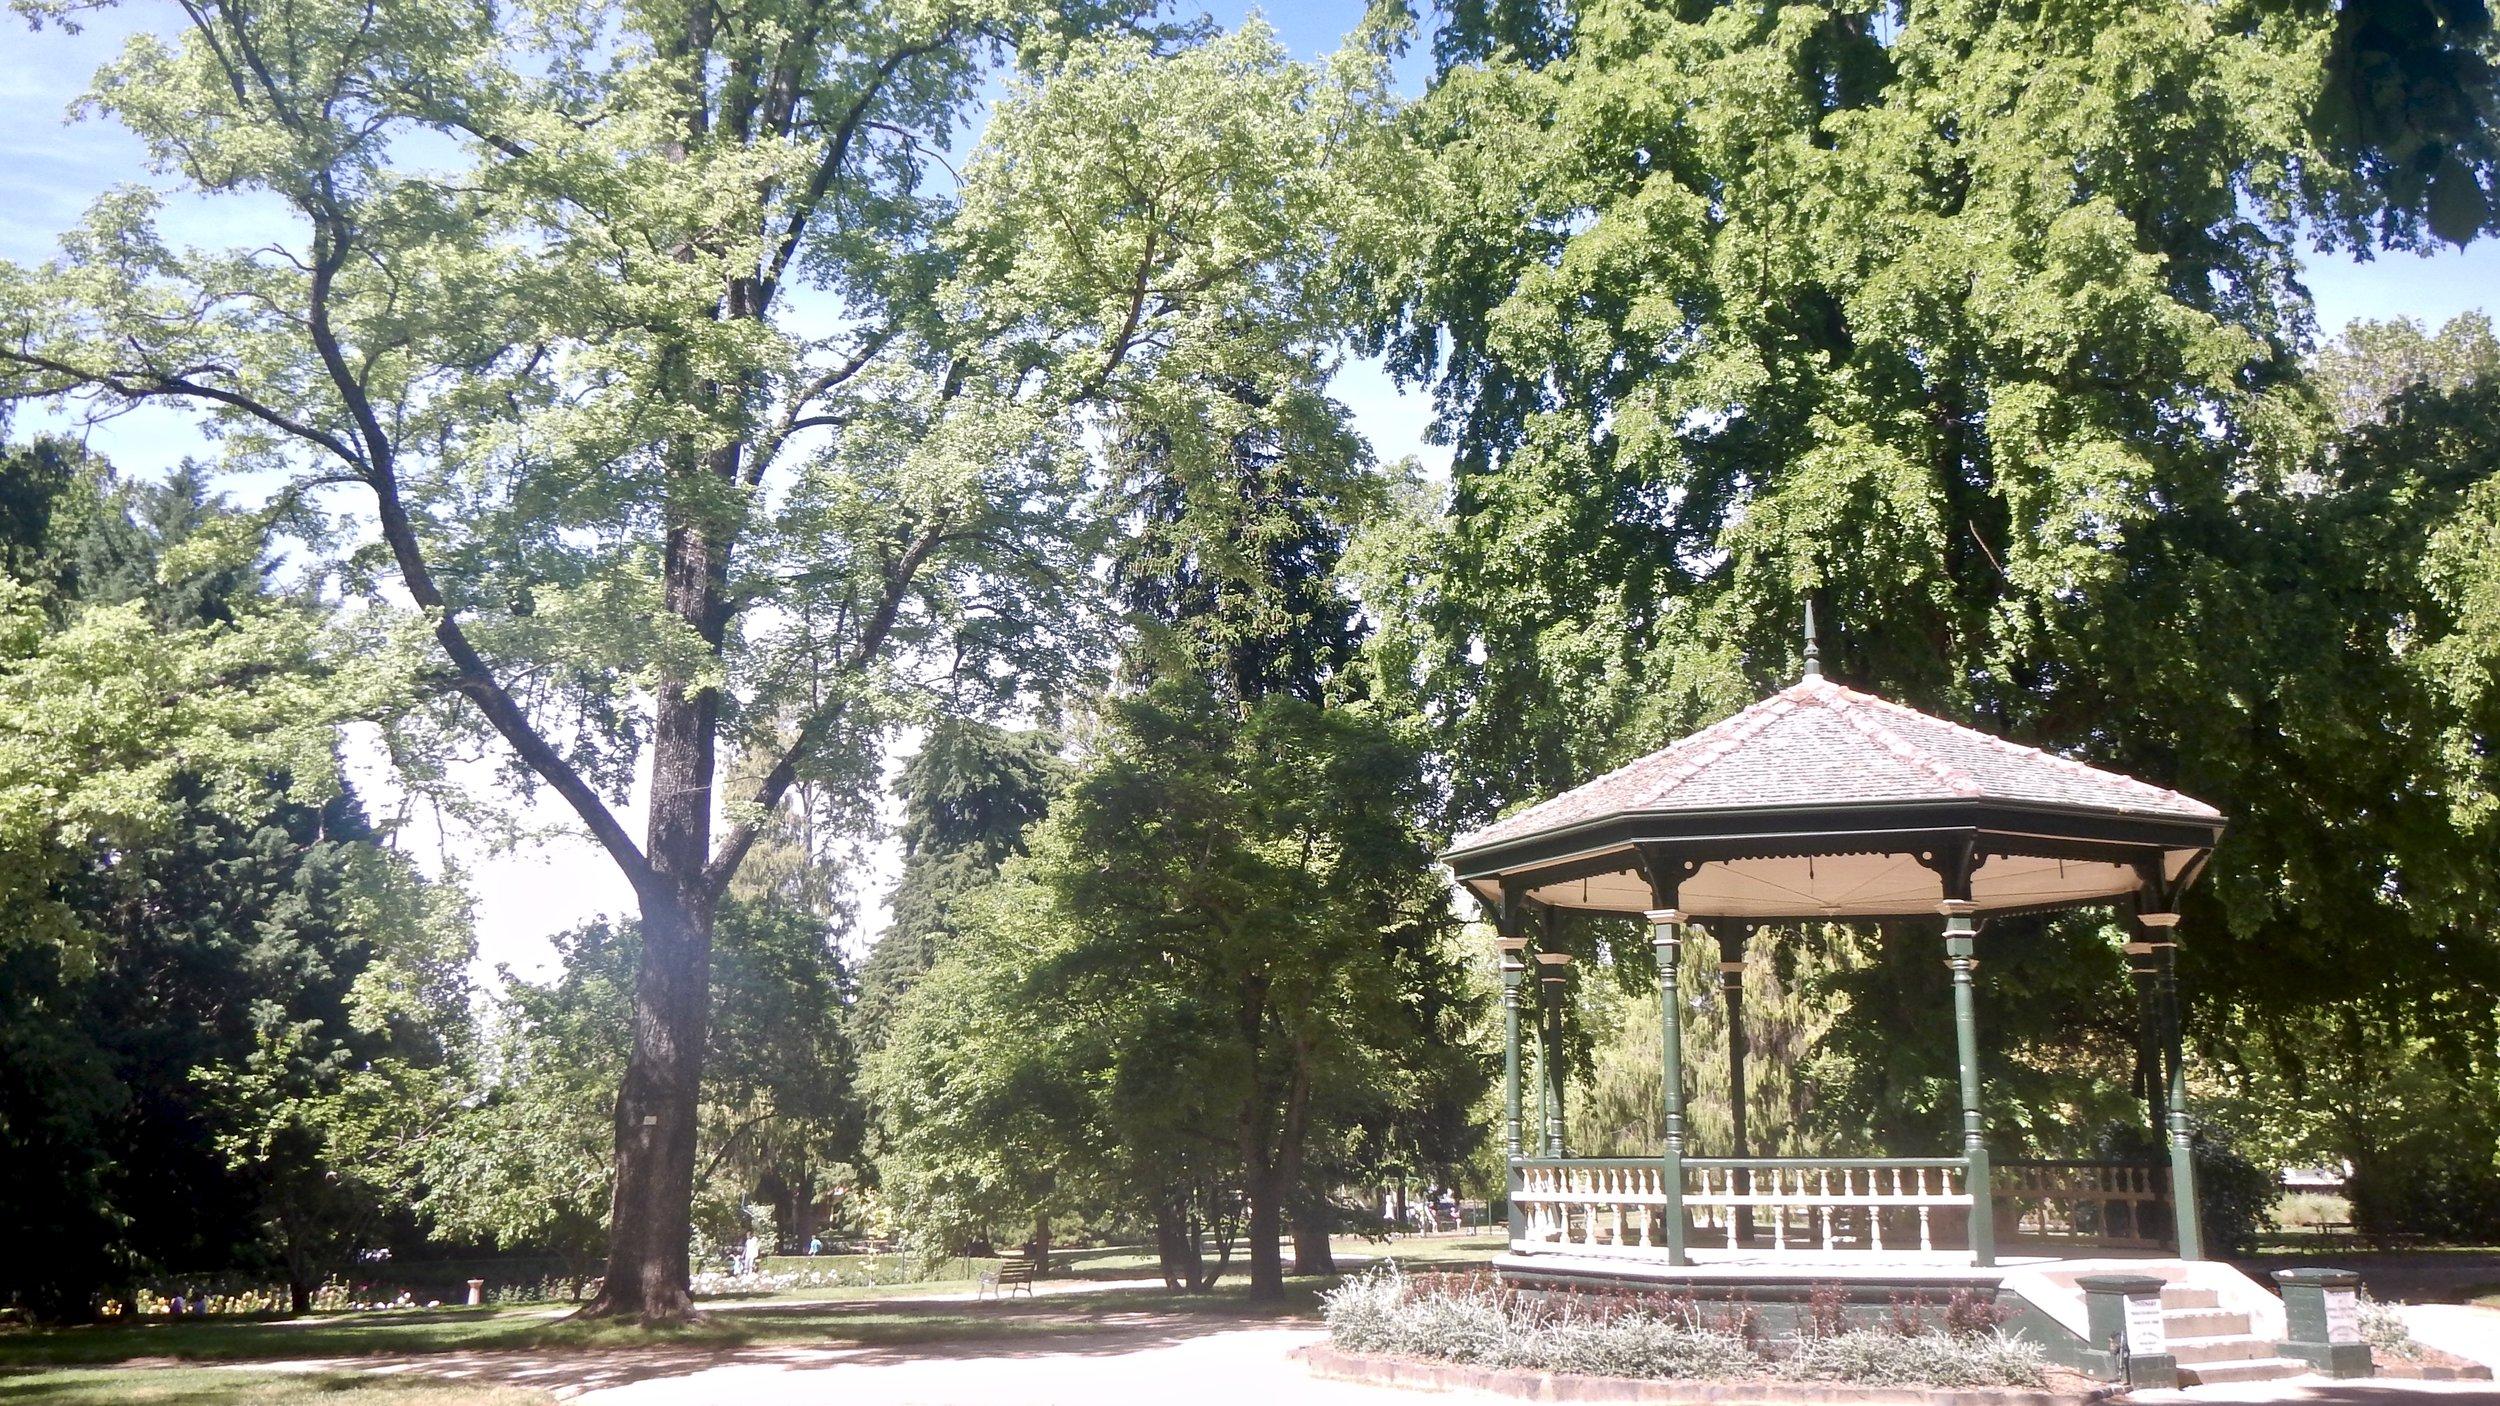 Cook Park, Orange, Central New South Wales, Australia